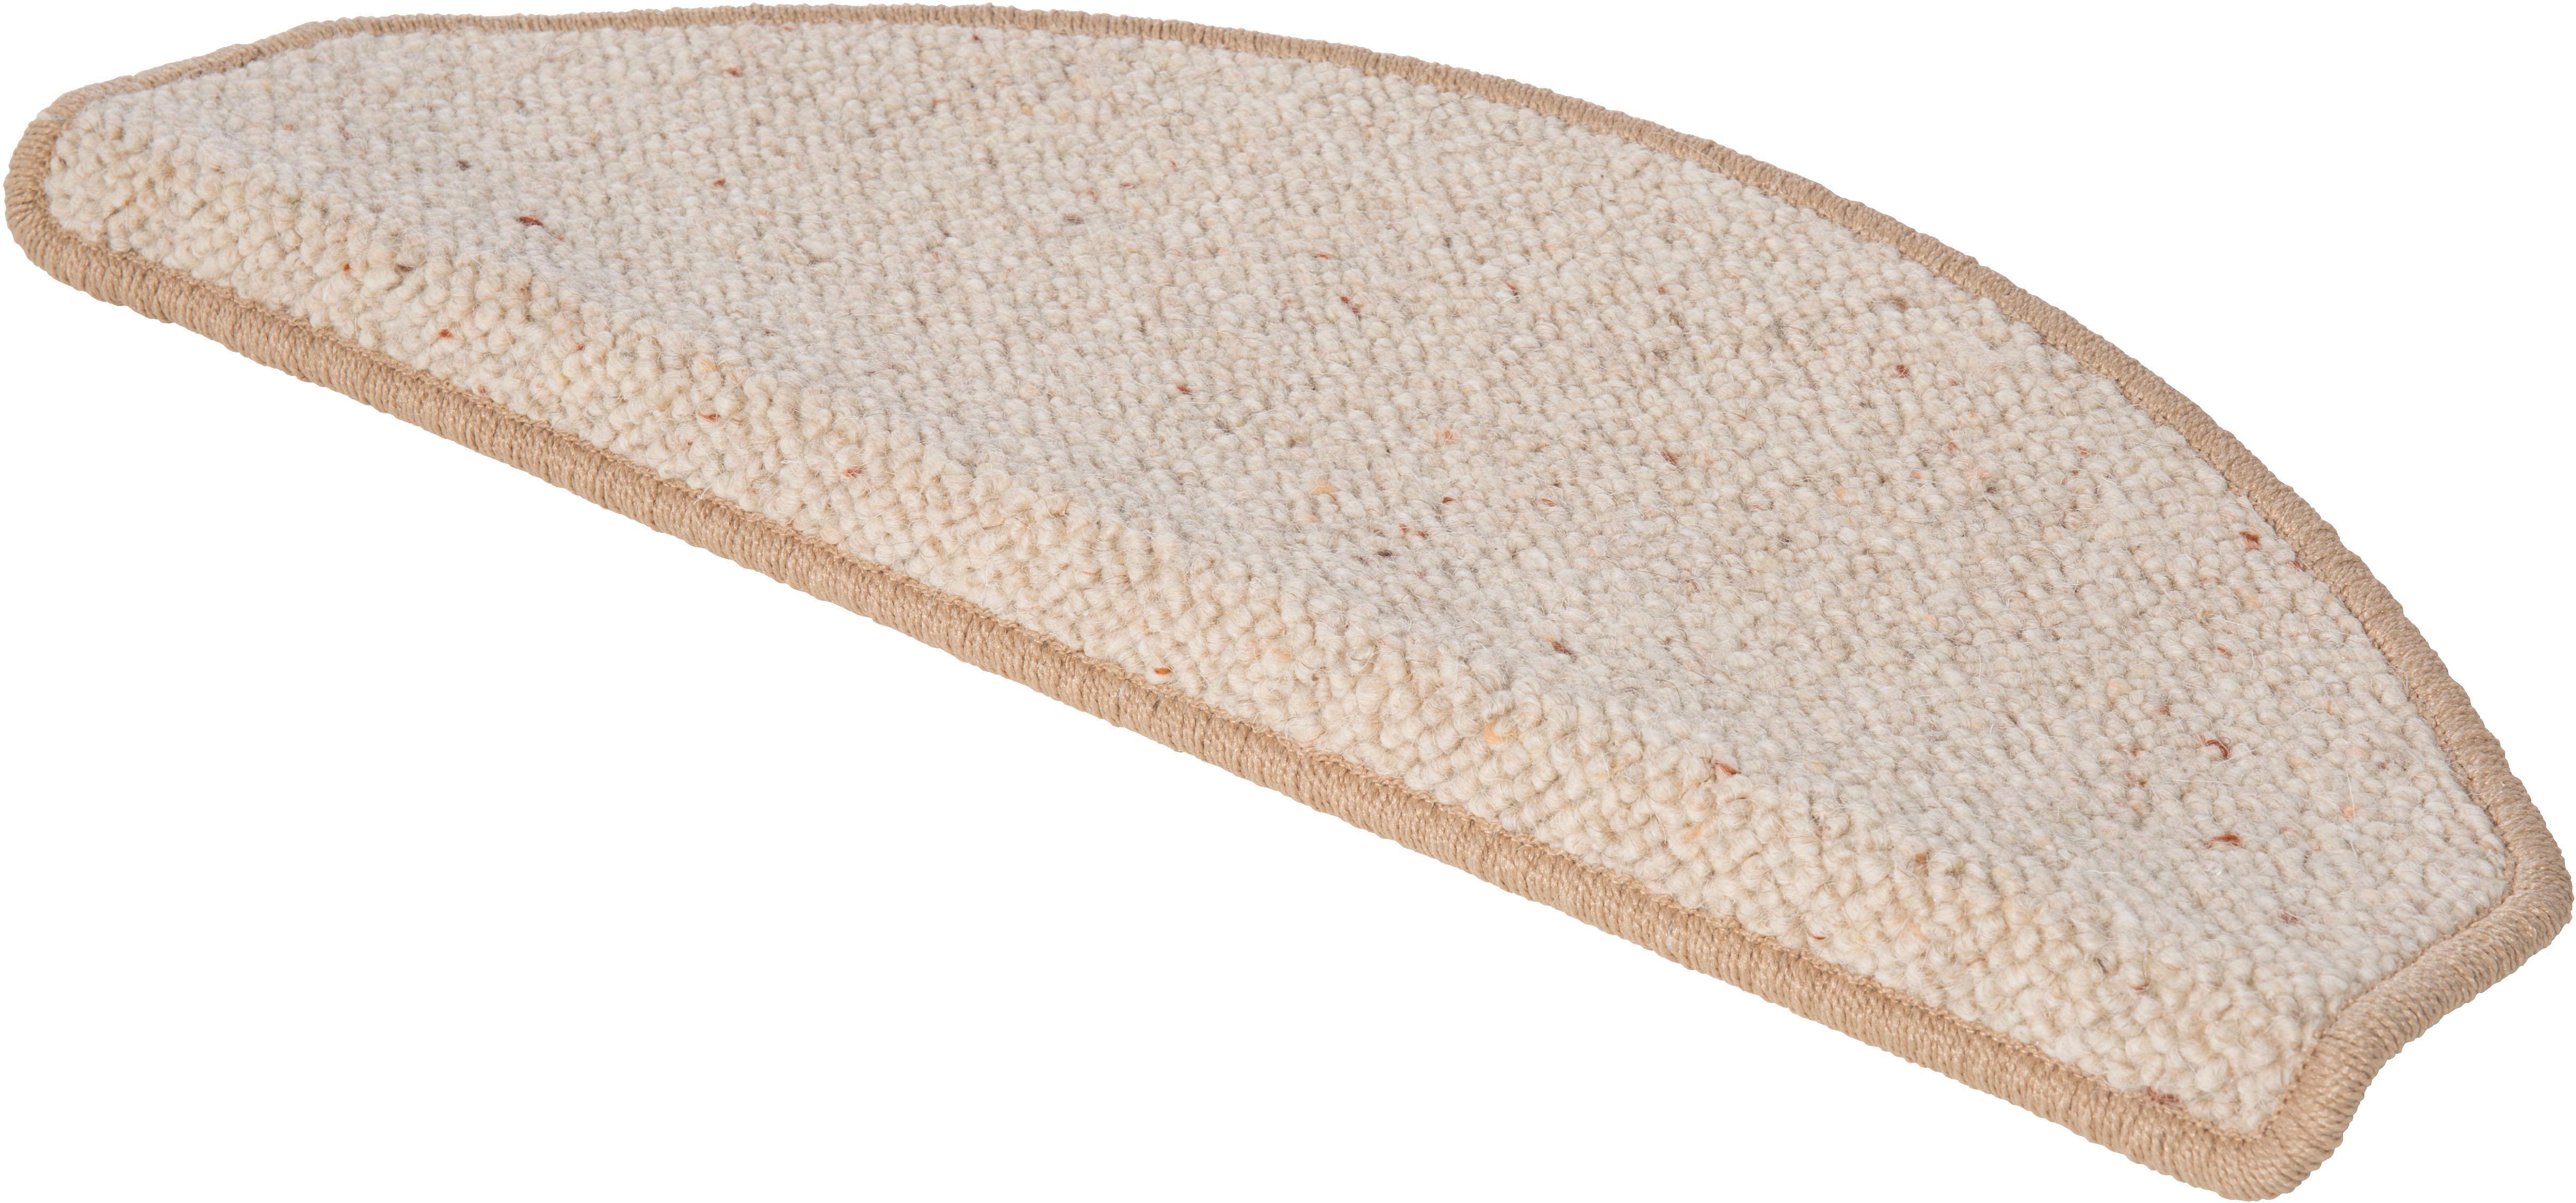 Stufenmatte Sheffield LUXOR living stufenförmig Höhe 5 mm maschinell getuftet